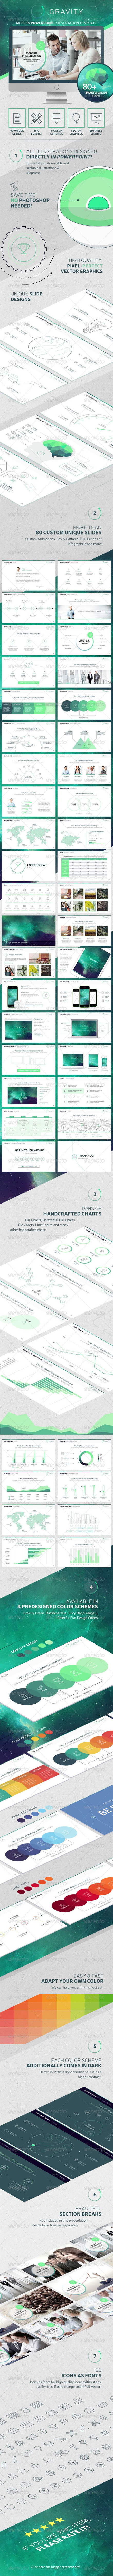 Gravity PowerPoint - Modern Presentation Template